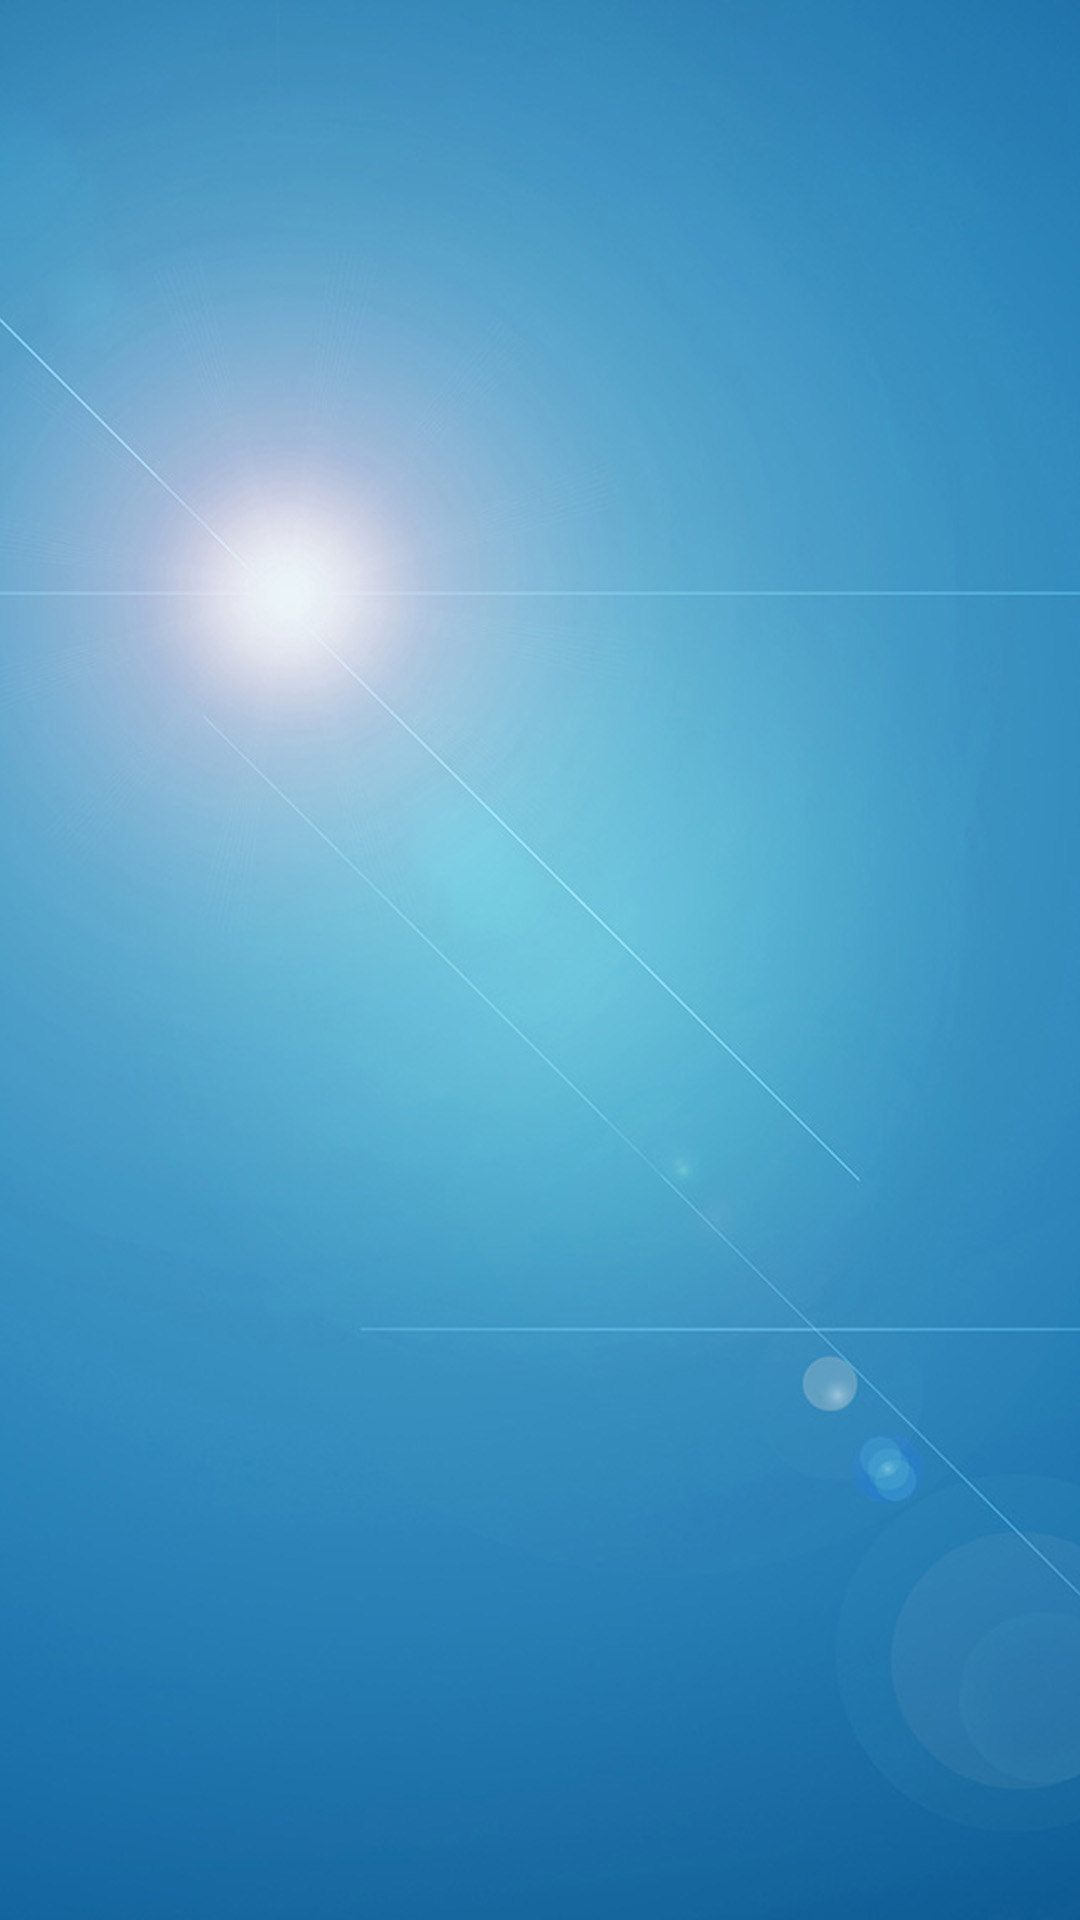 Nature Sun Samsung Galaxy S5 Wallpaper HD 1080x1920